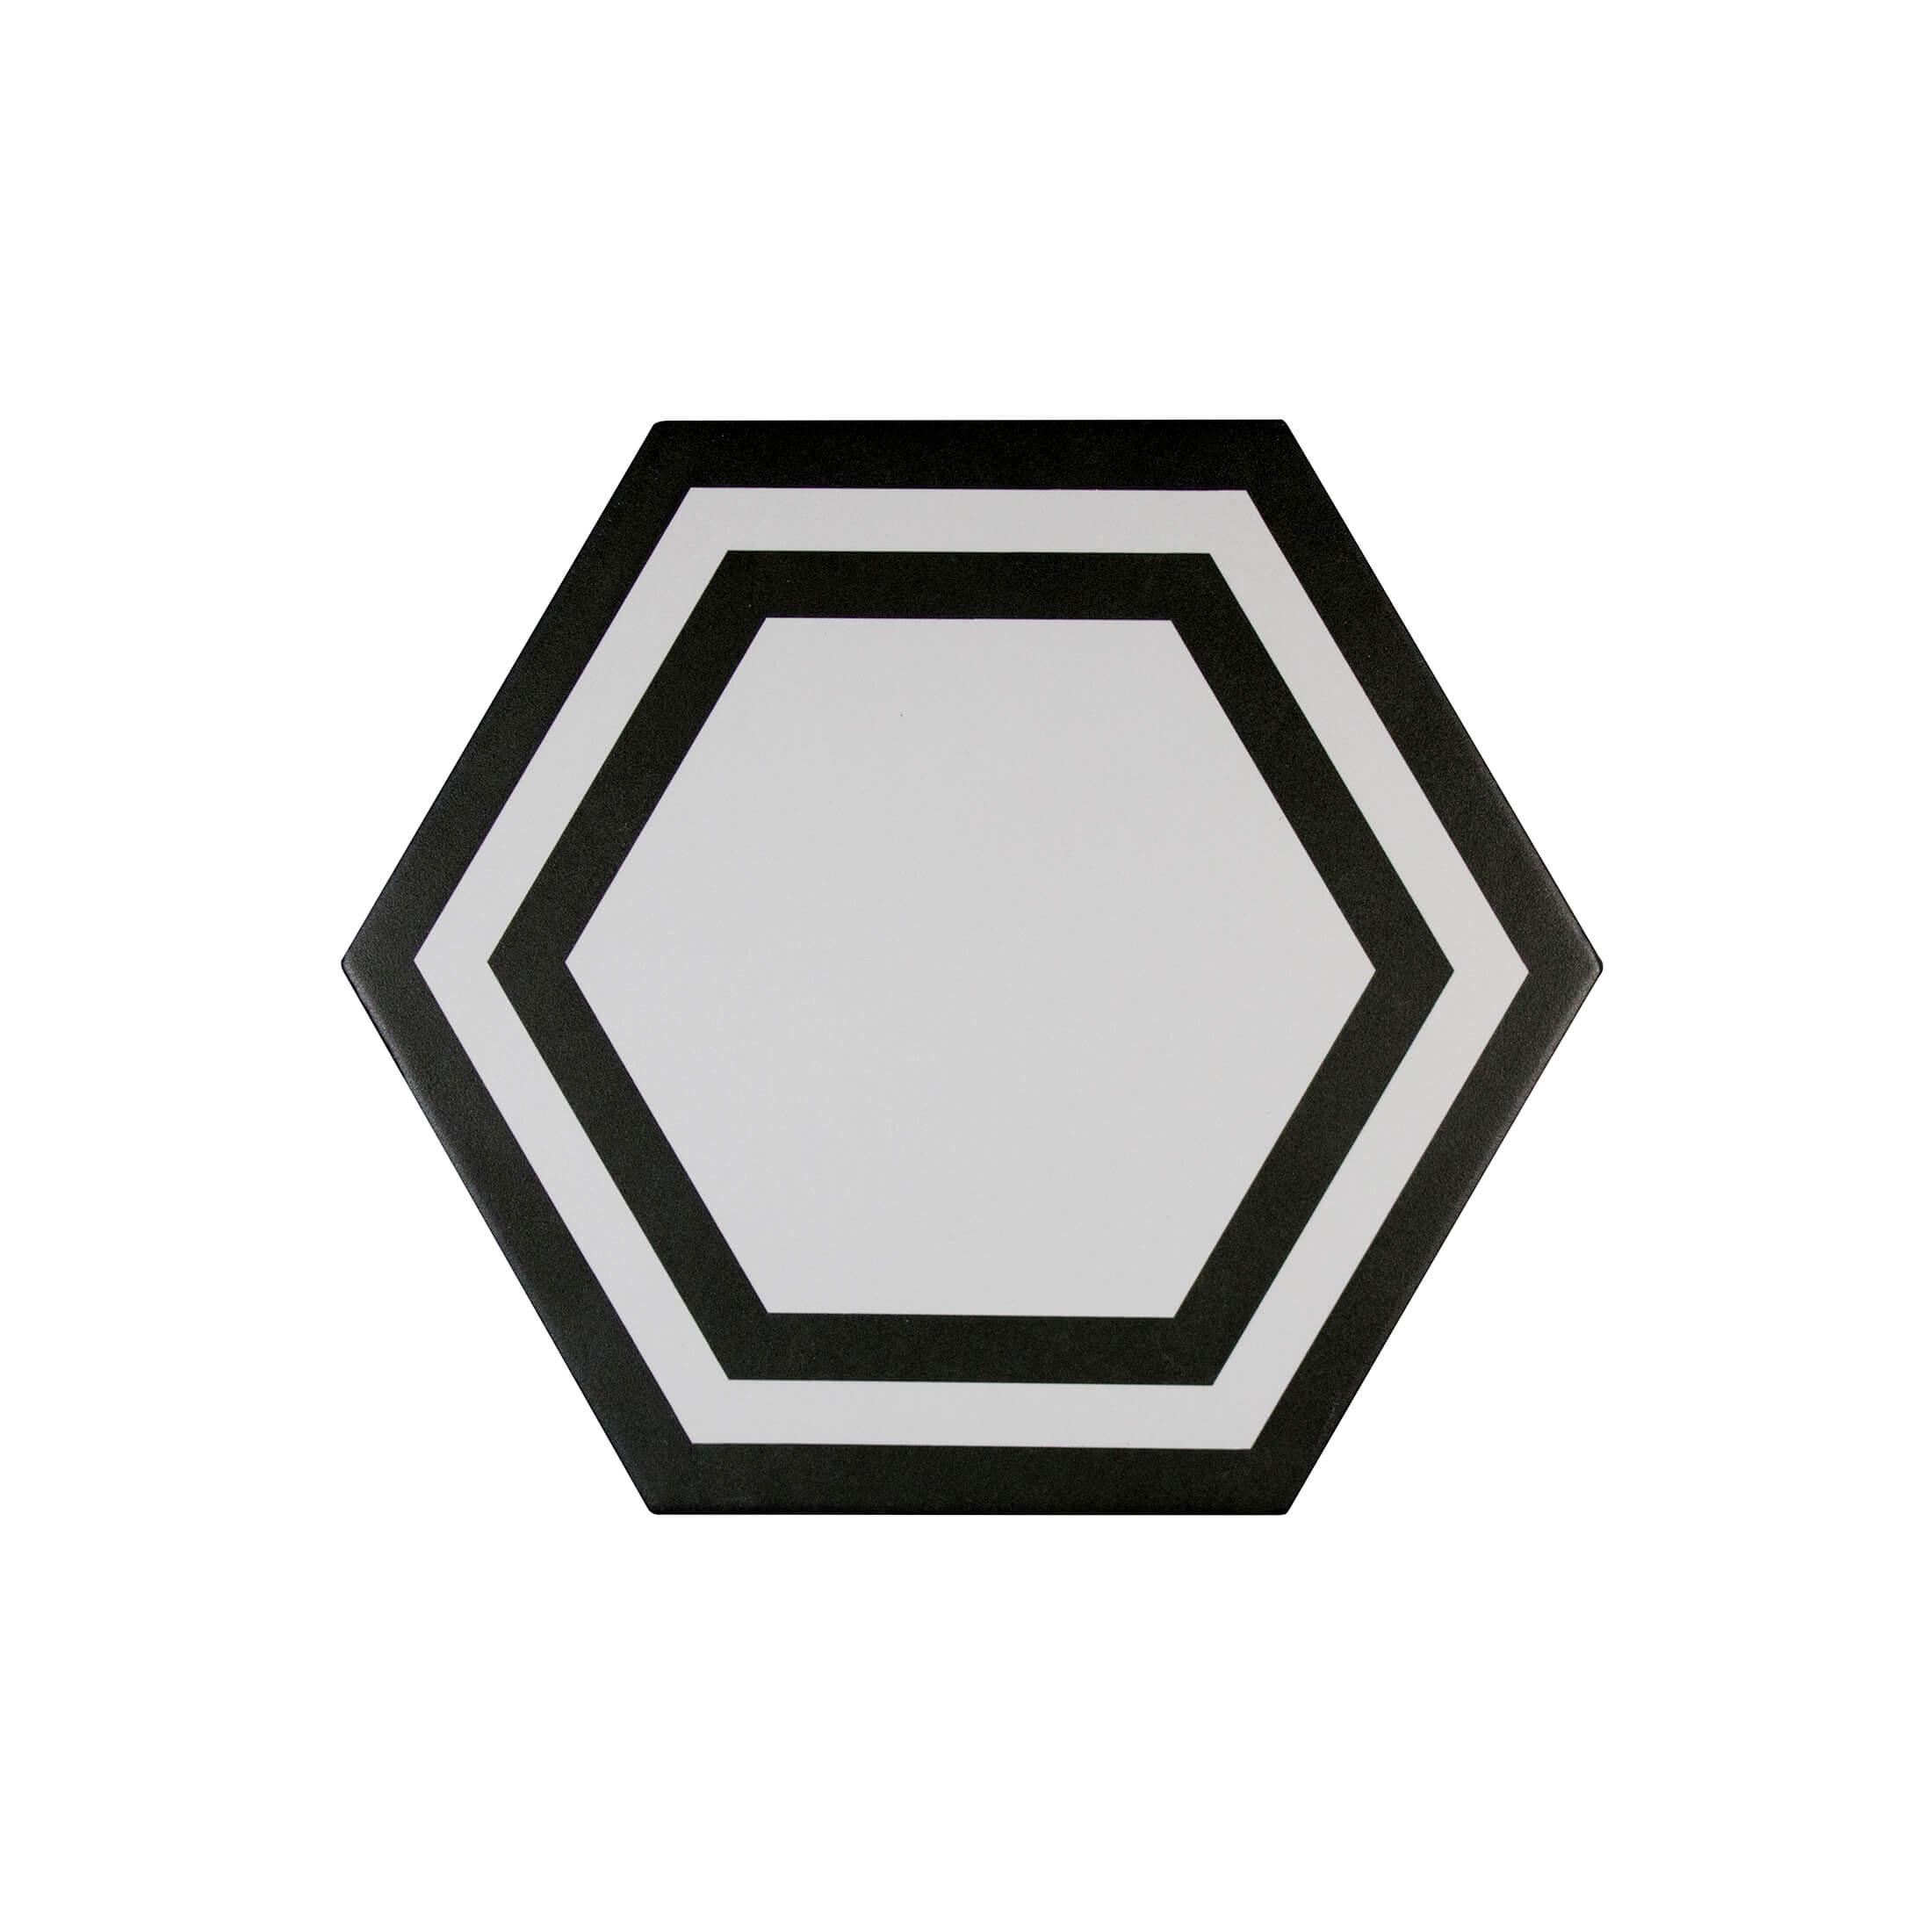 ADPV9020 - PAVIMENTO DECO BLACK - 20 cm X 2,3 cm